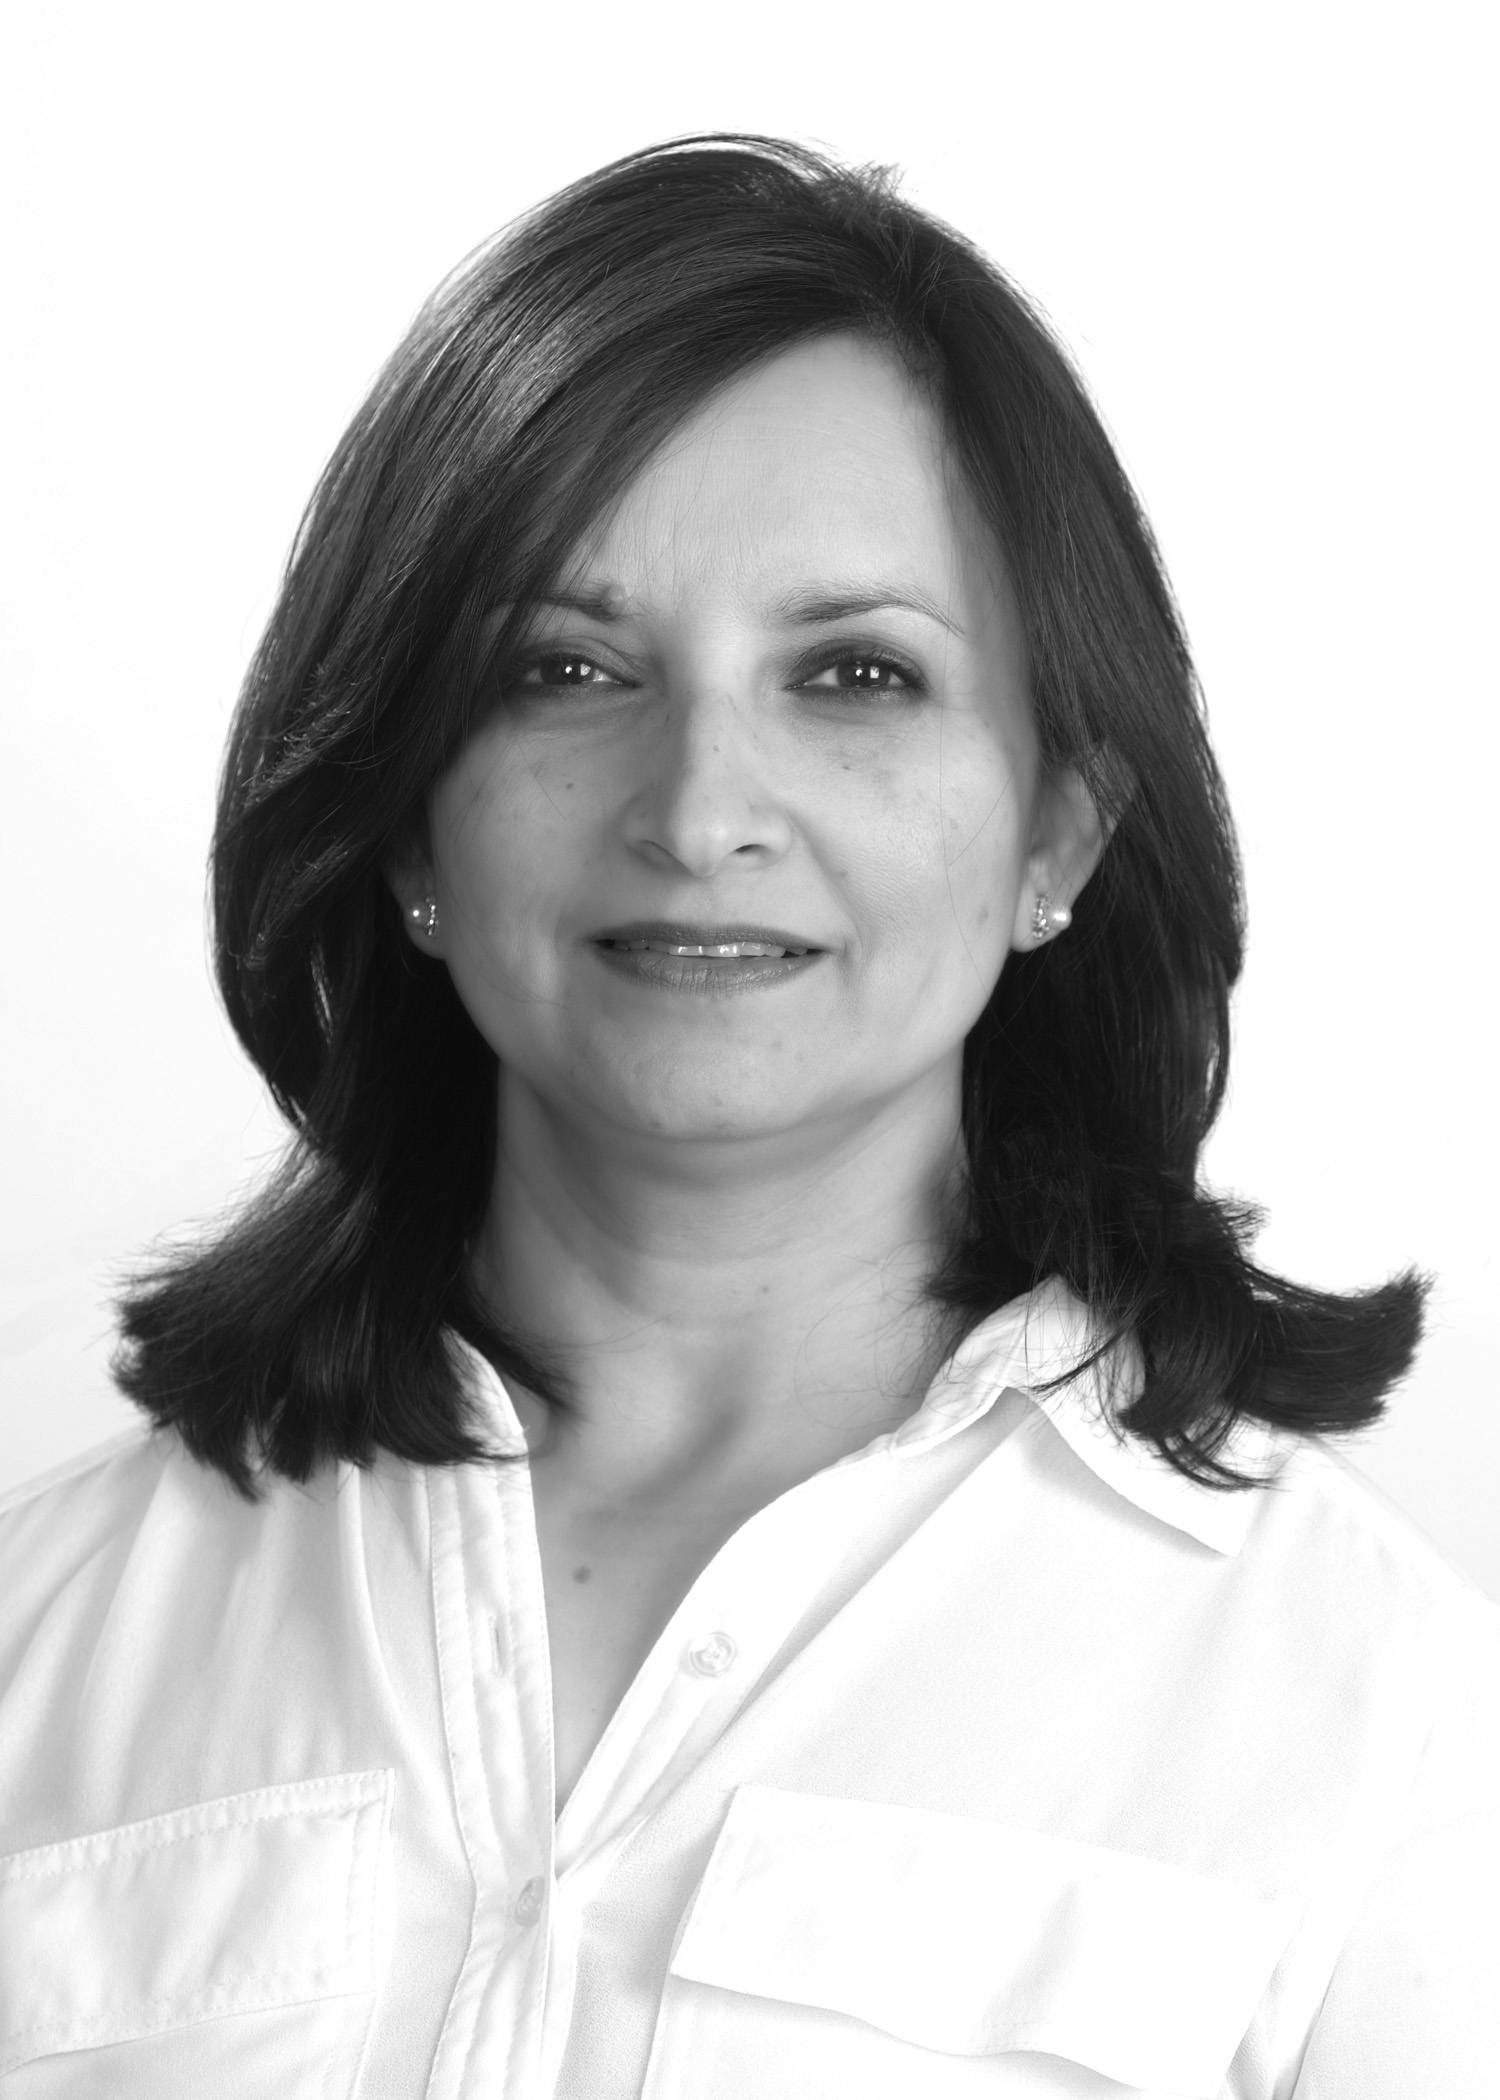 Photo of Naz Hashmi